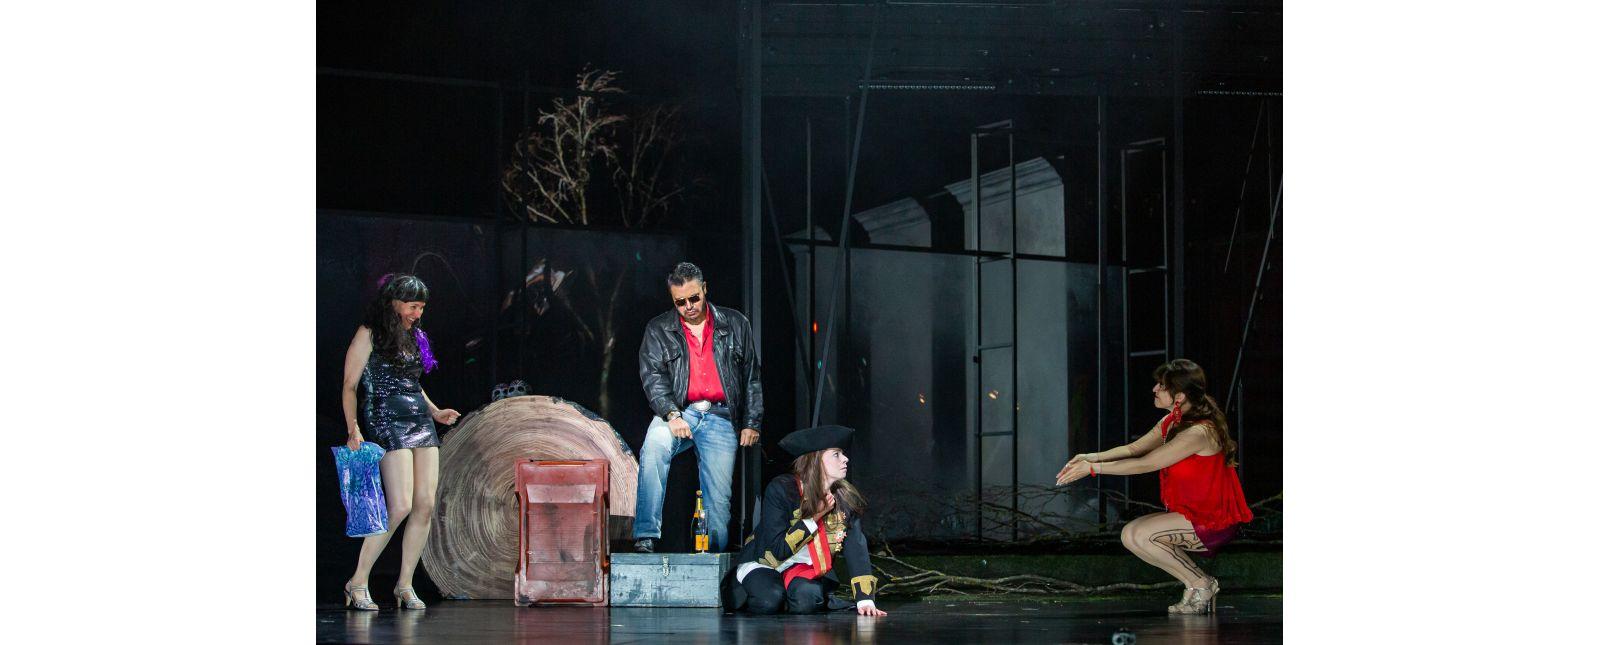 DIDO UND AENEAS // Anja Steinert / Juan Orozco / Janina Staub / Yulianna Vaydner // Foto: Laura Nickel